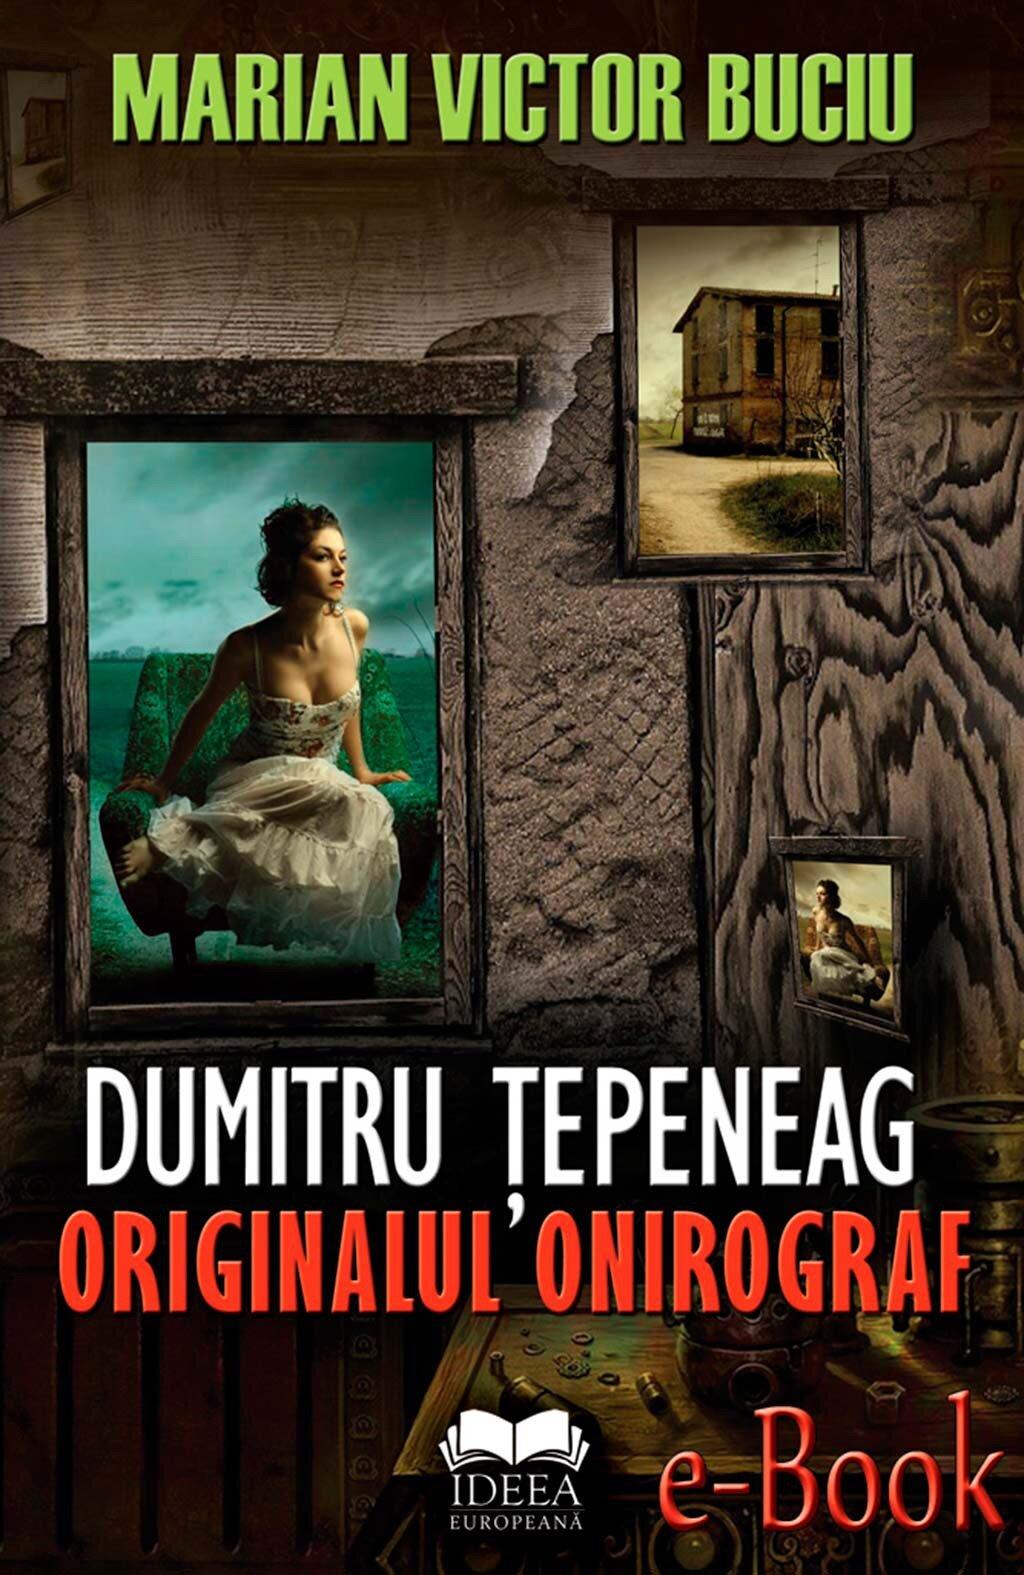 Dumitru Tepeneag. Originalul onirograf (eBook)